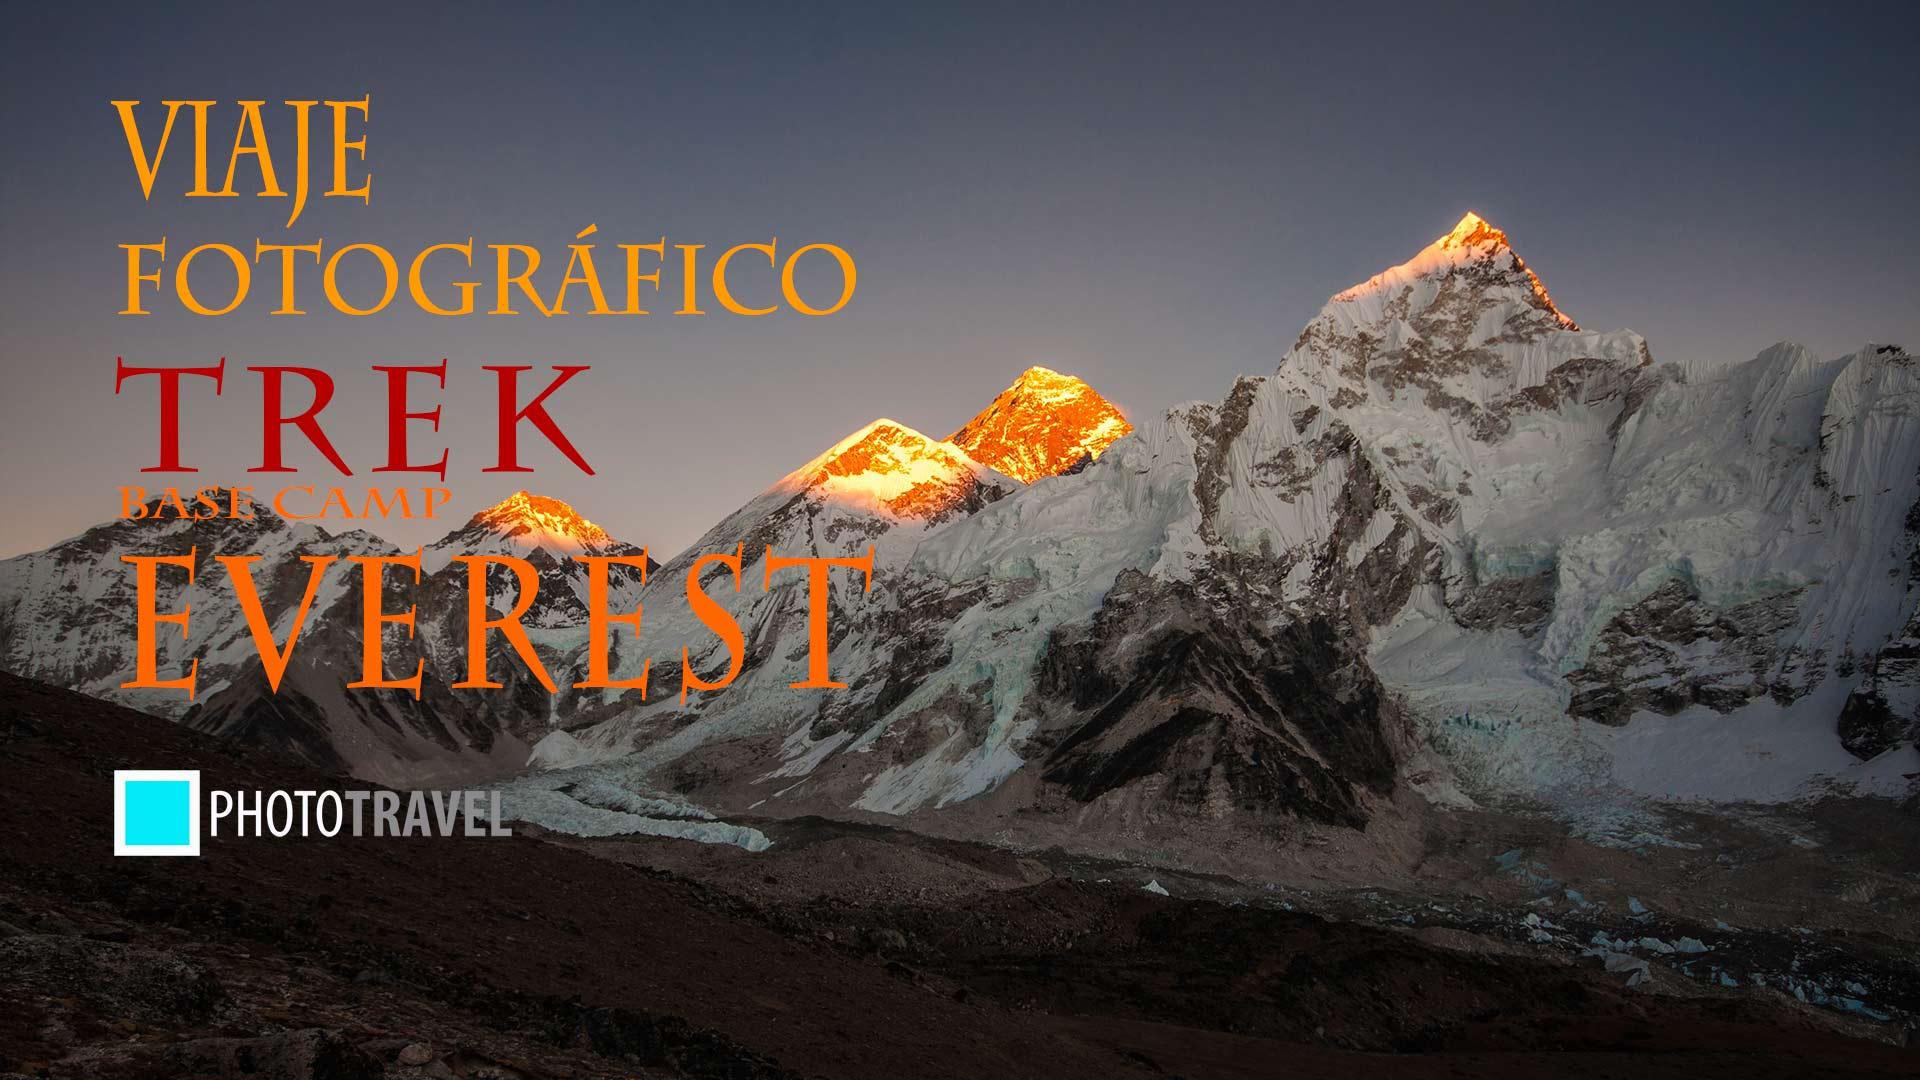 viaje-fotografico-everest